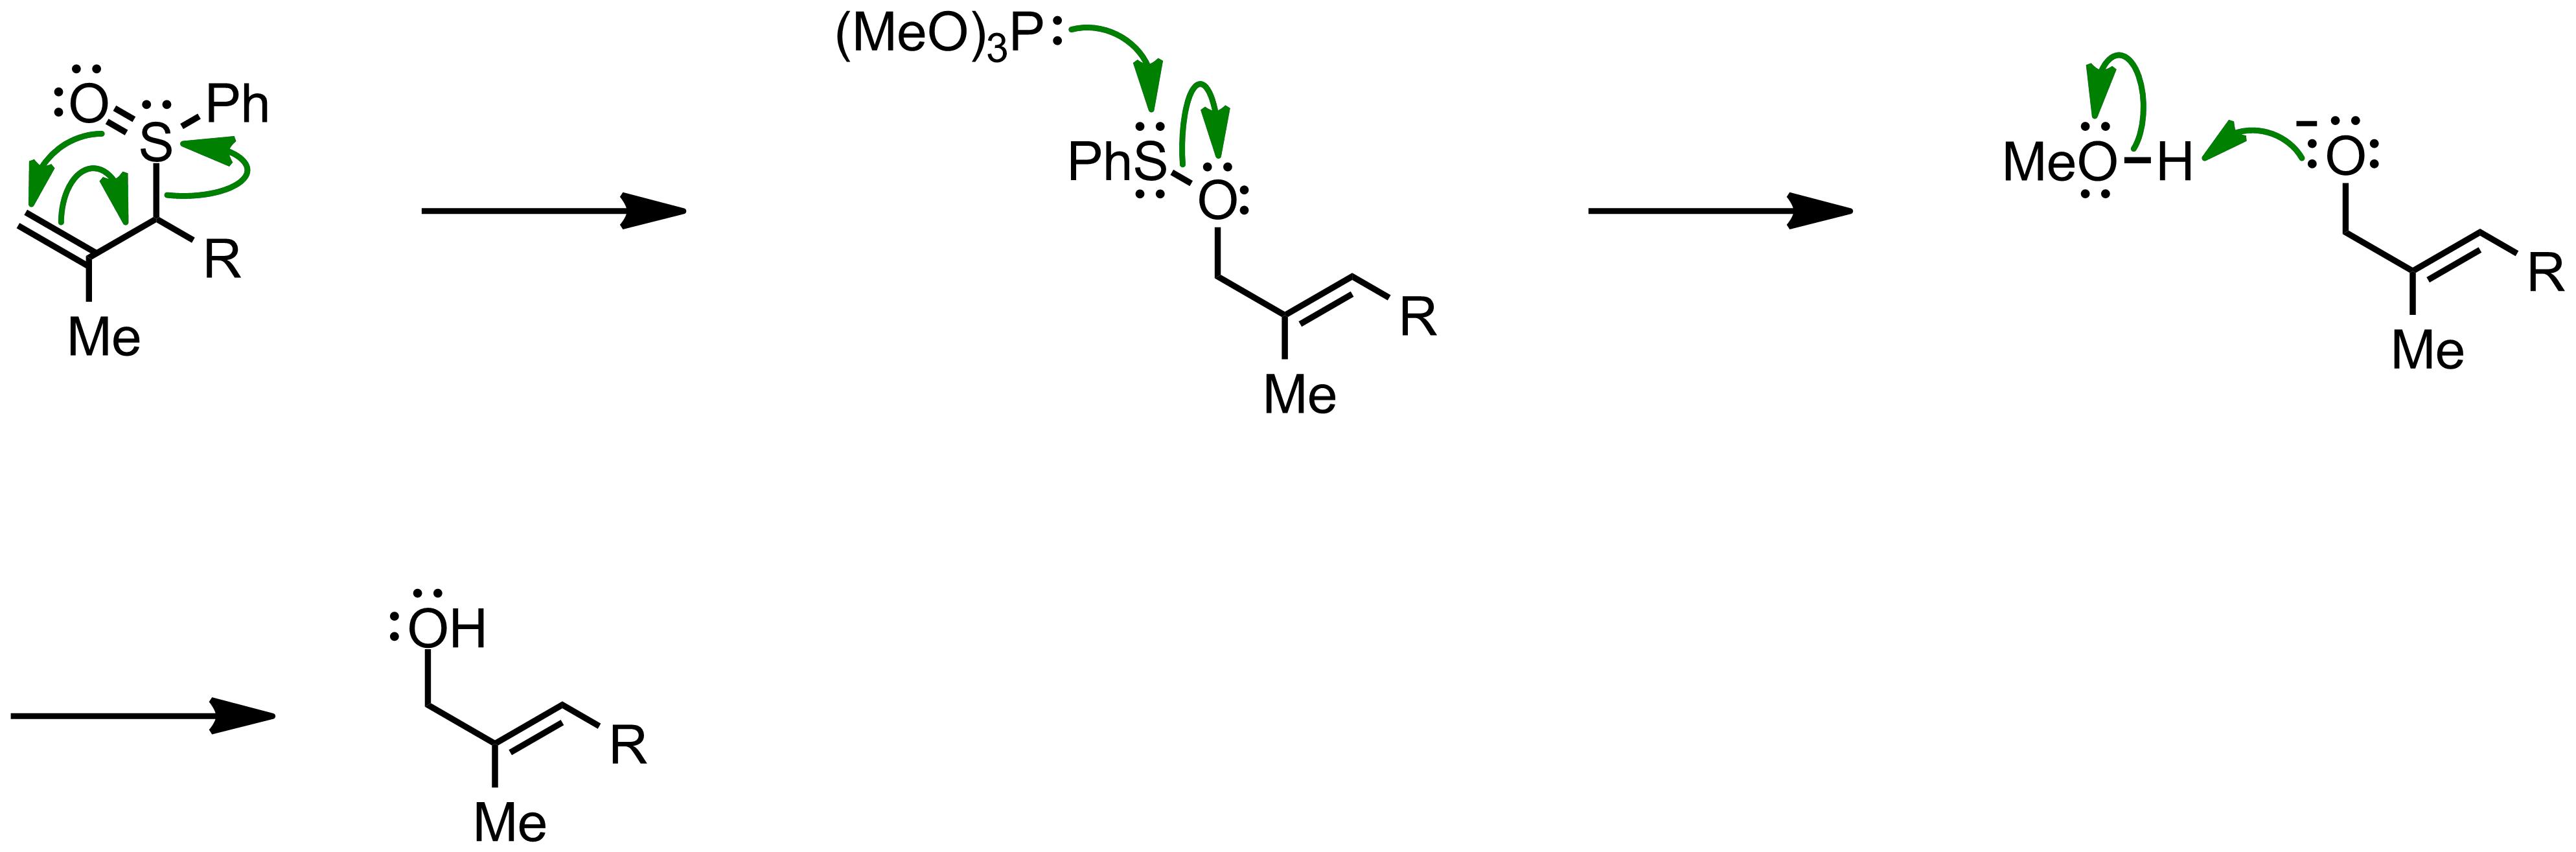 Mechanism of the Evans-Mislow Rearrangement